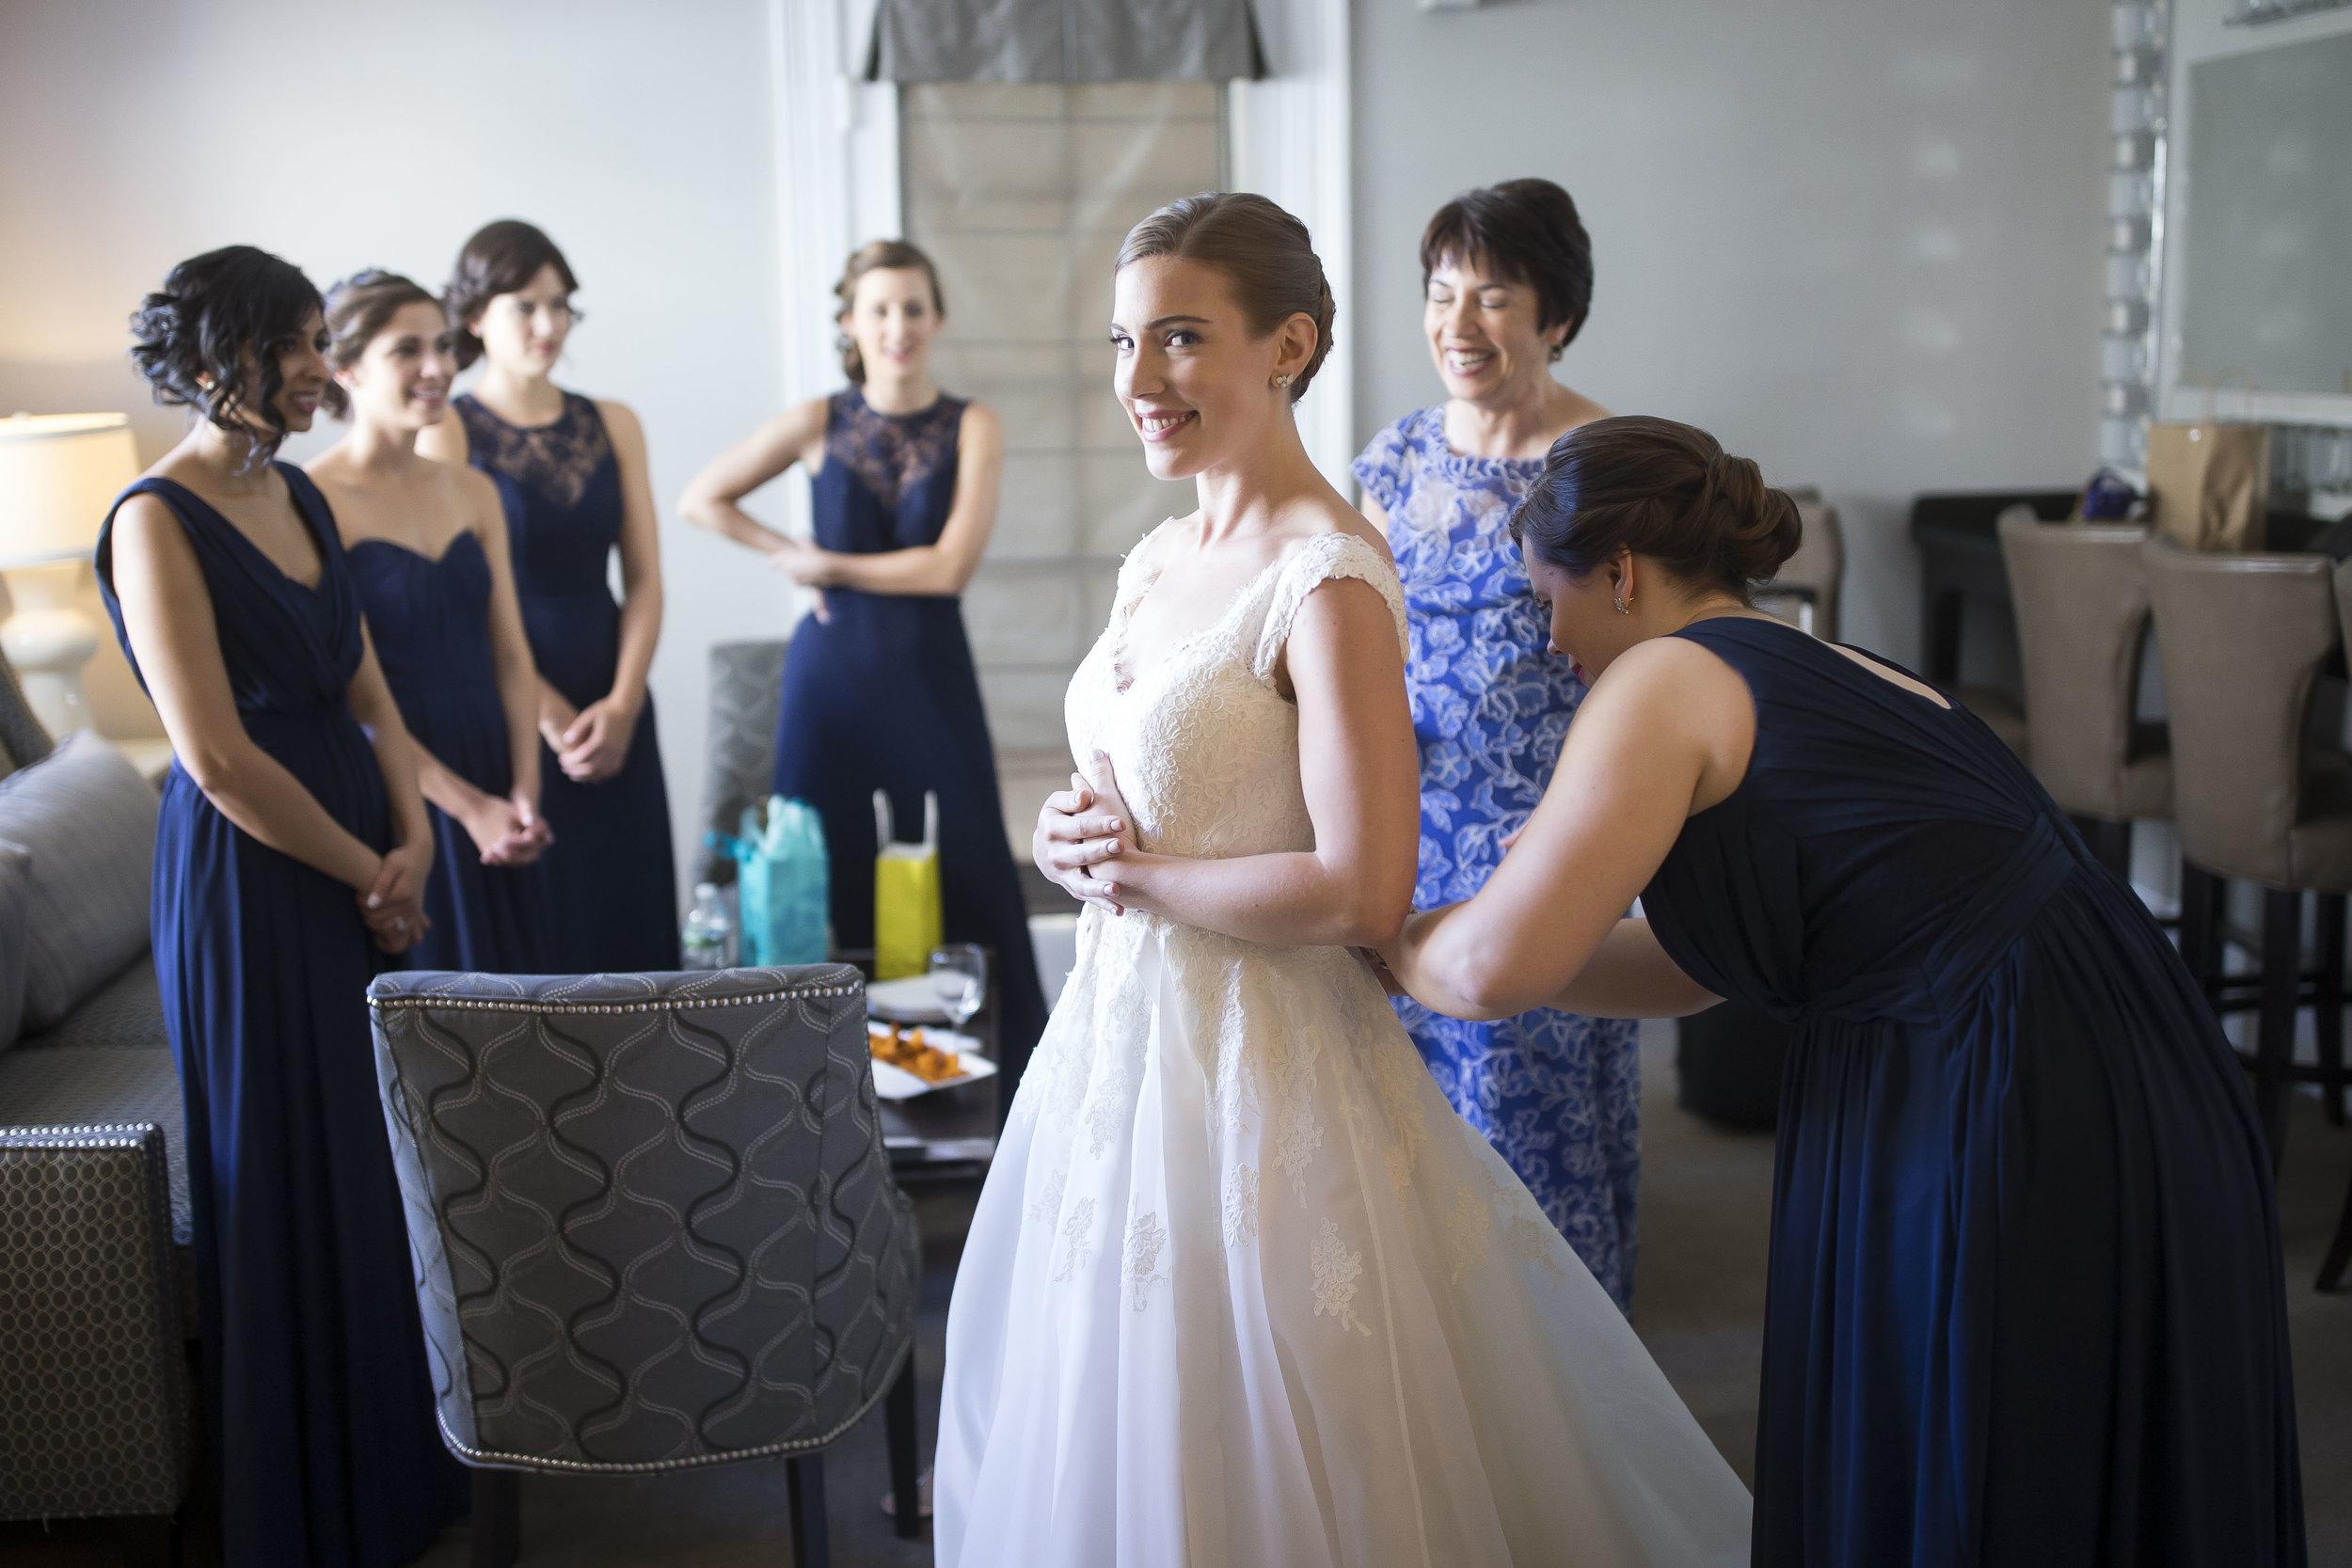 Tappan-Hill-Wedding-Photographer-0021.JPG